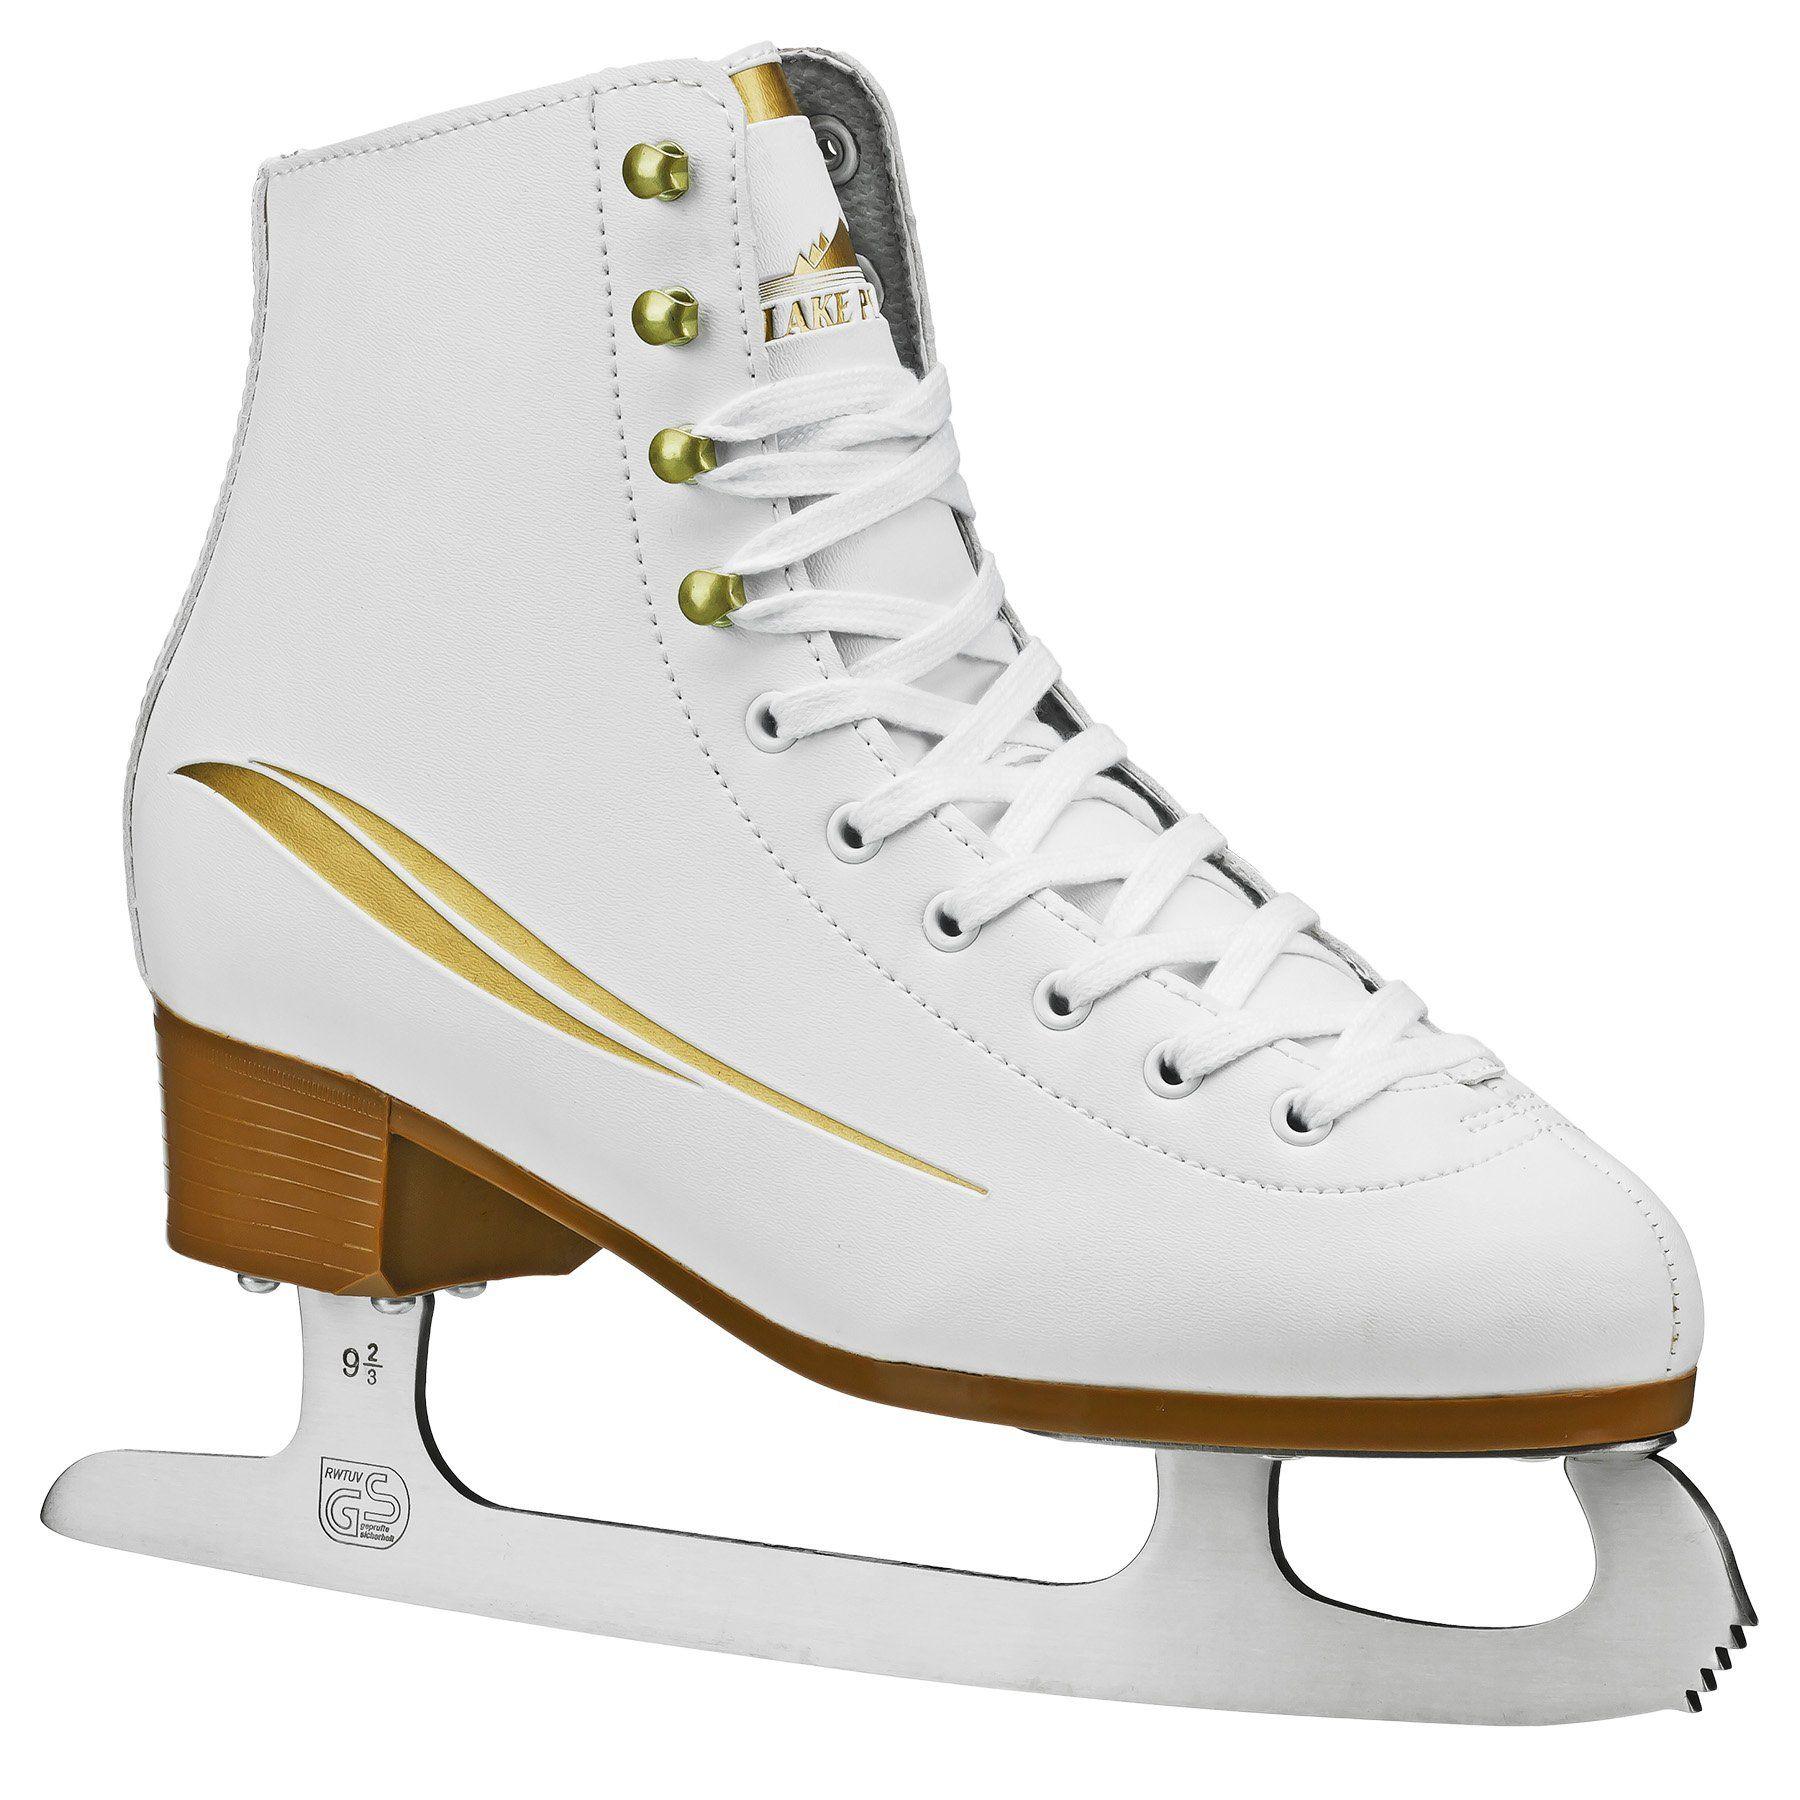 Roces Caje Ice Skates